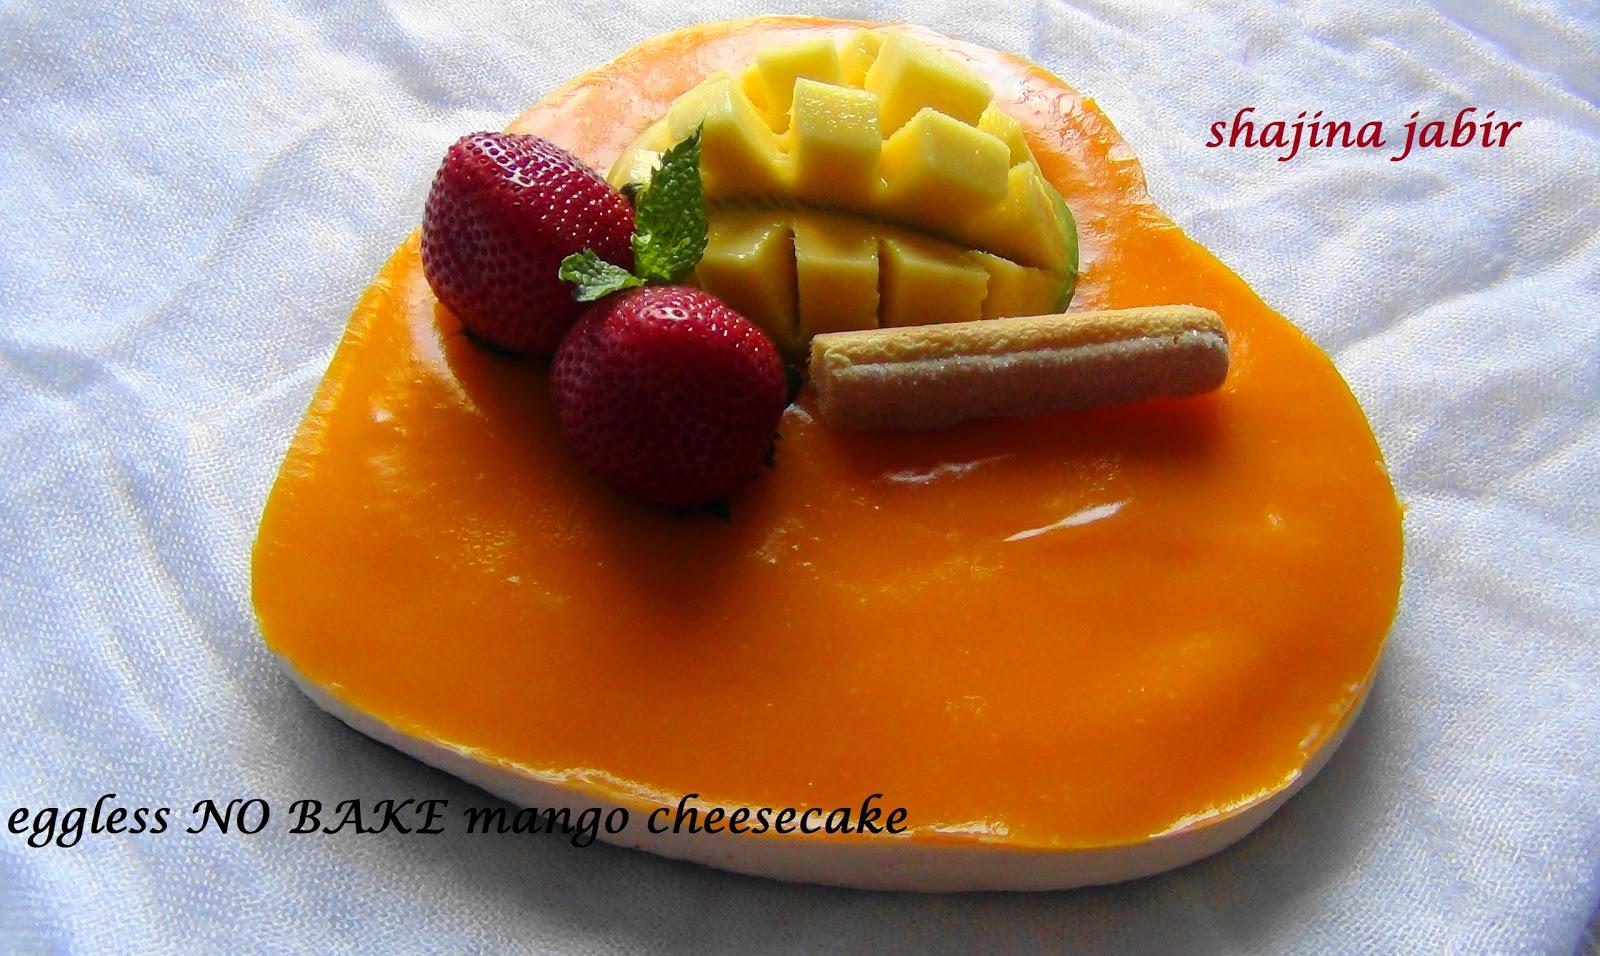 Recipesmine Eggless No Bake Mango Cheesecake Recipe